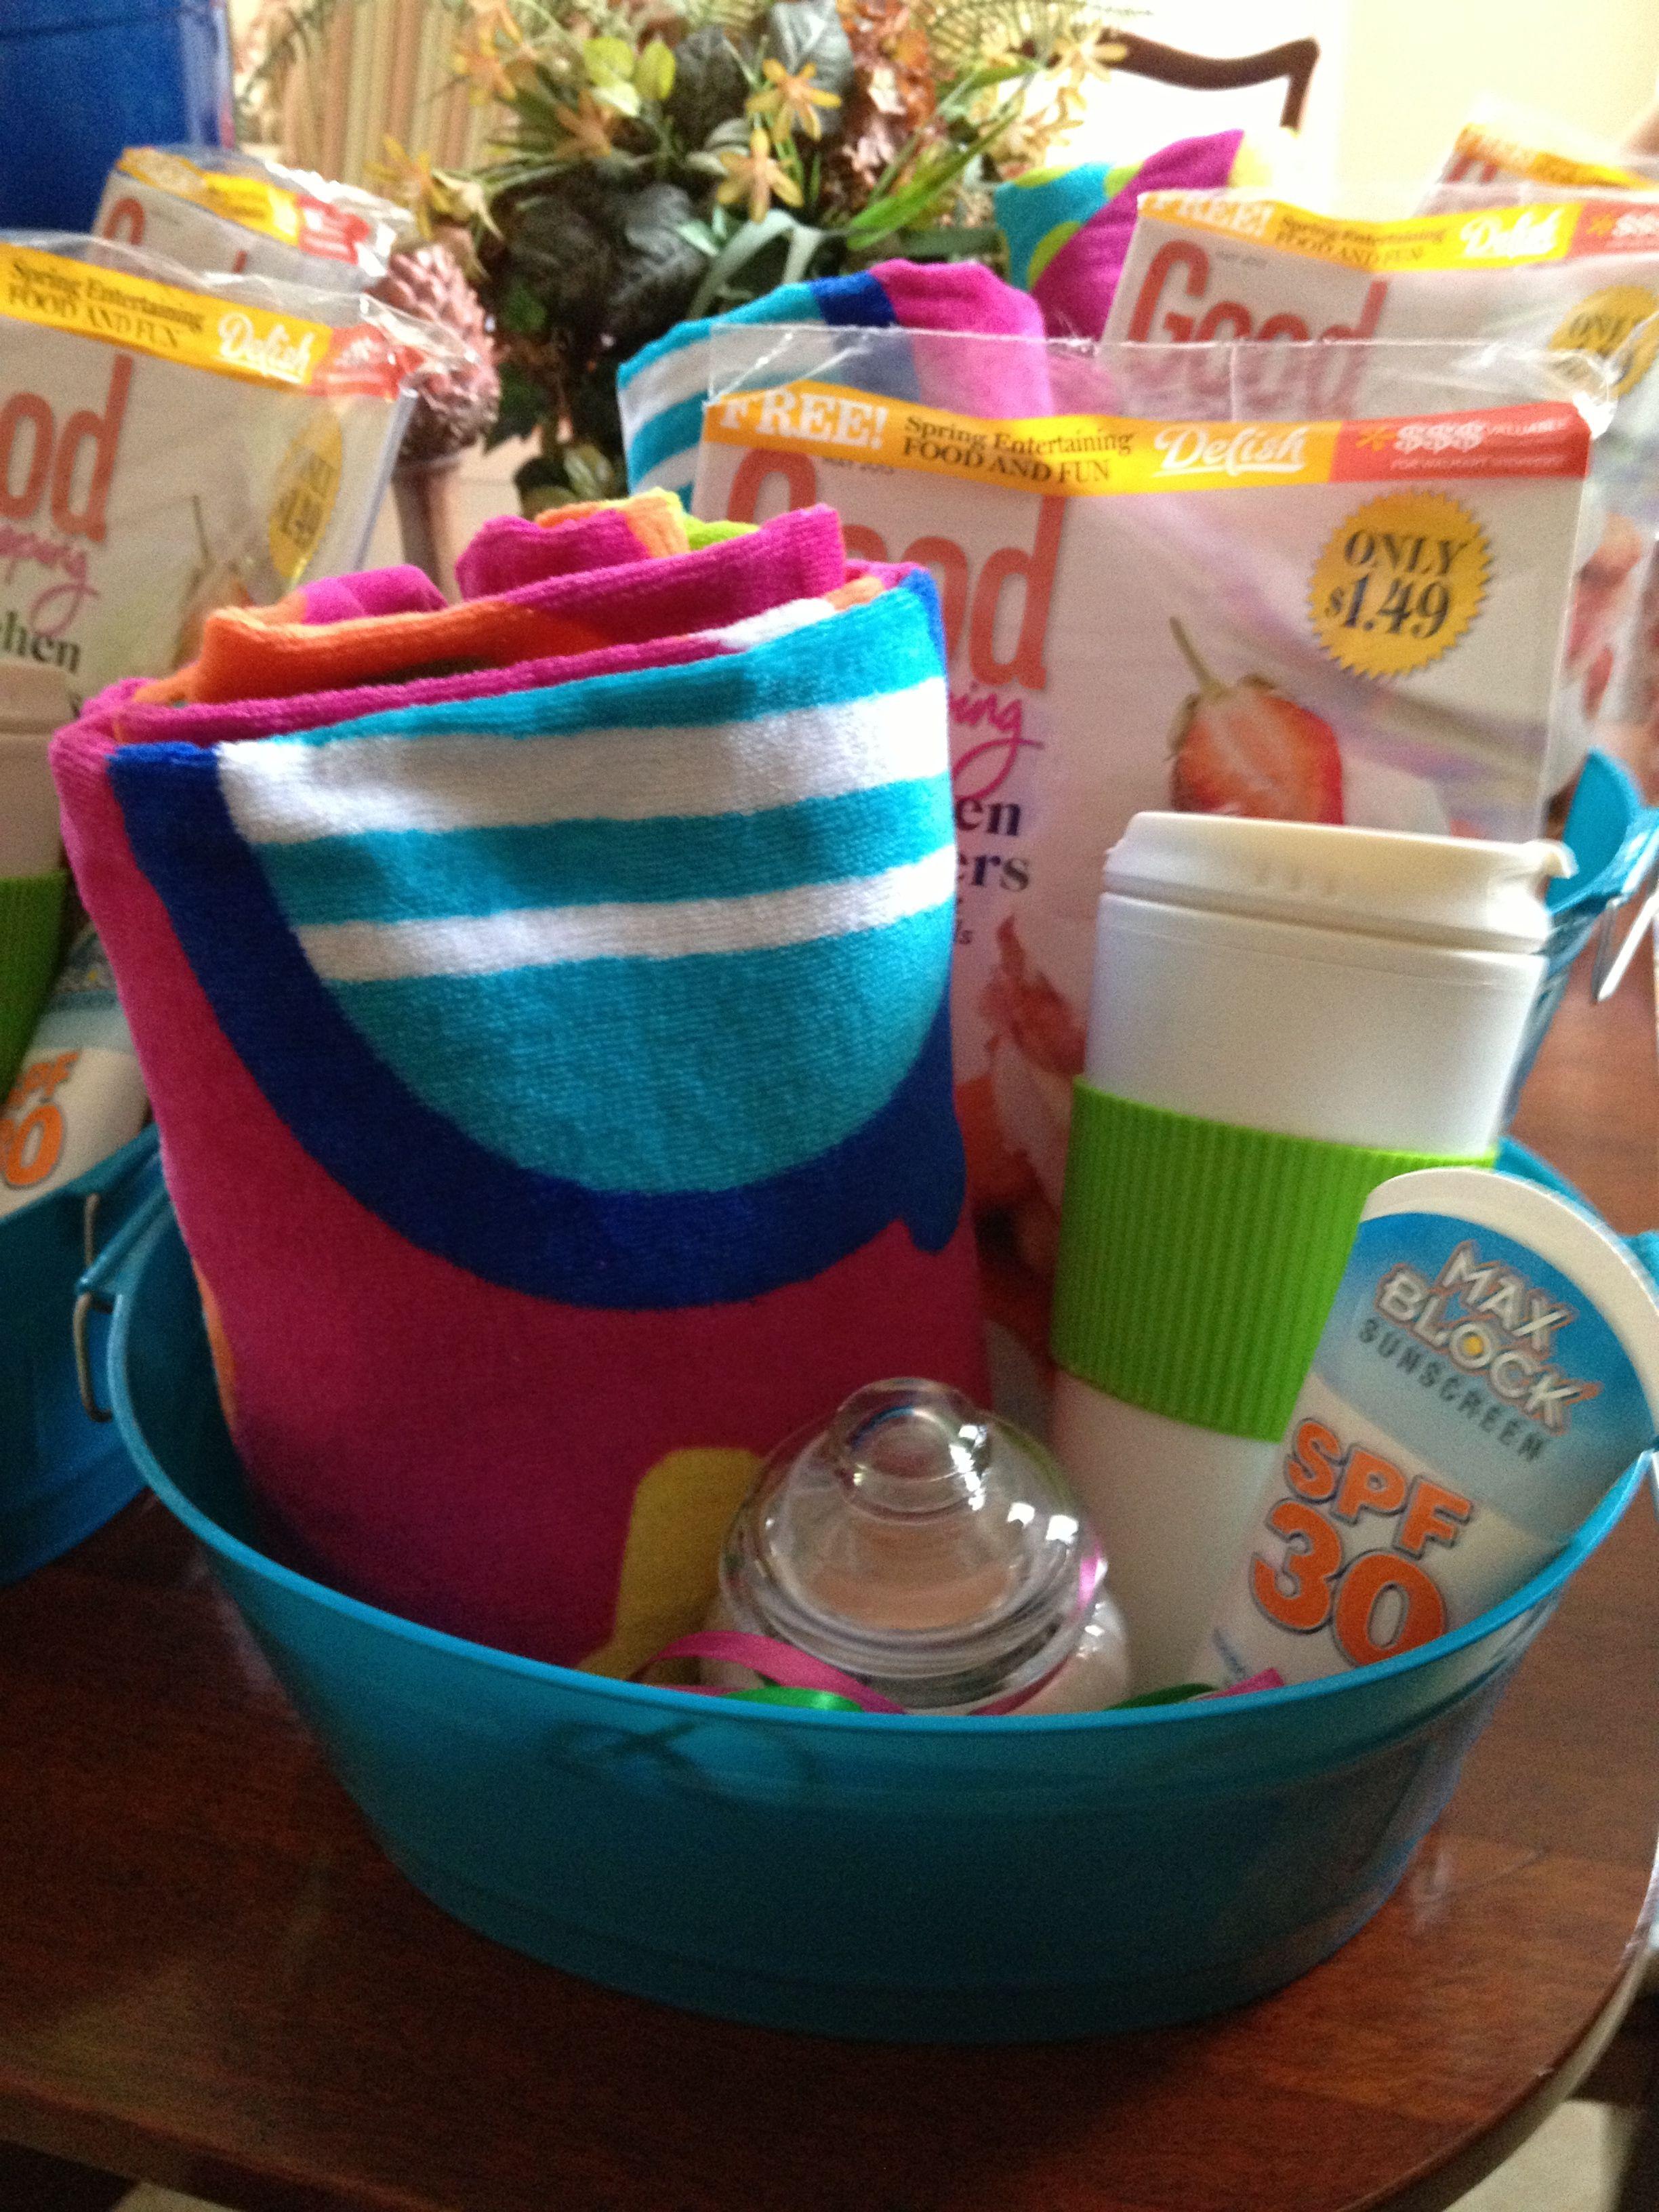 End of year teacher gift towel magazine sun screen